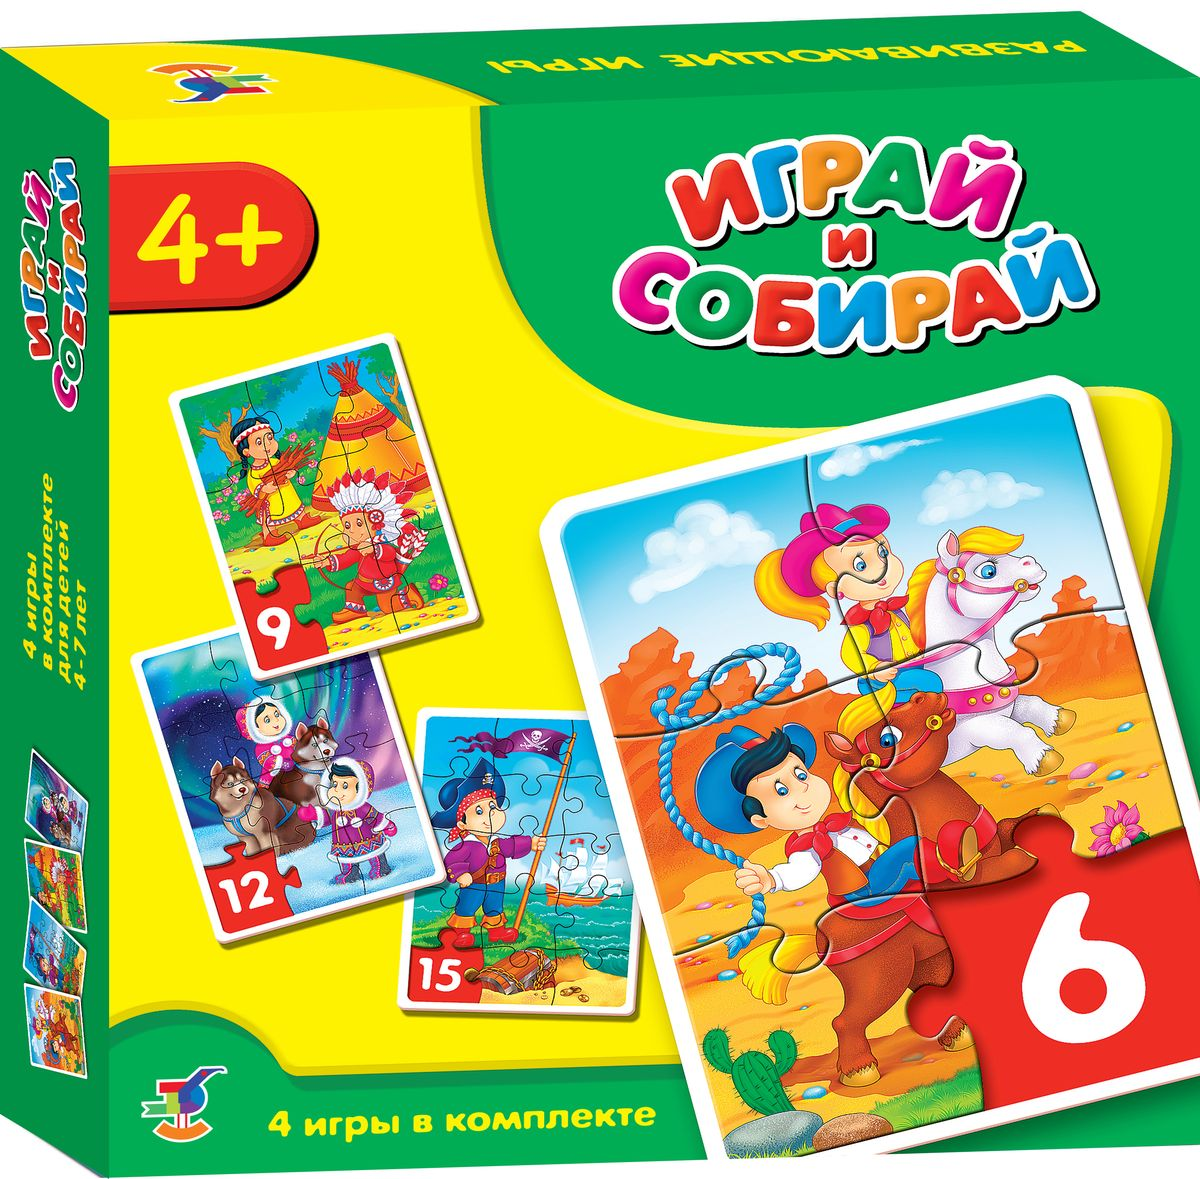 Дрофа-Медиа Пазл для малышей Играй и собирай 4 в 1 2939 дрофа медиа пазл для малышей играй и собирай 4 в 1 2944